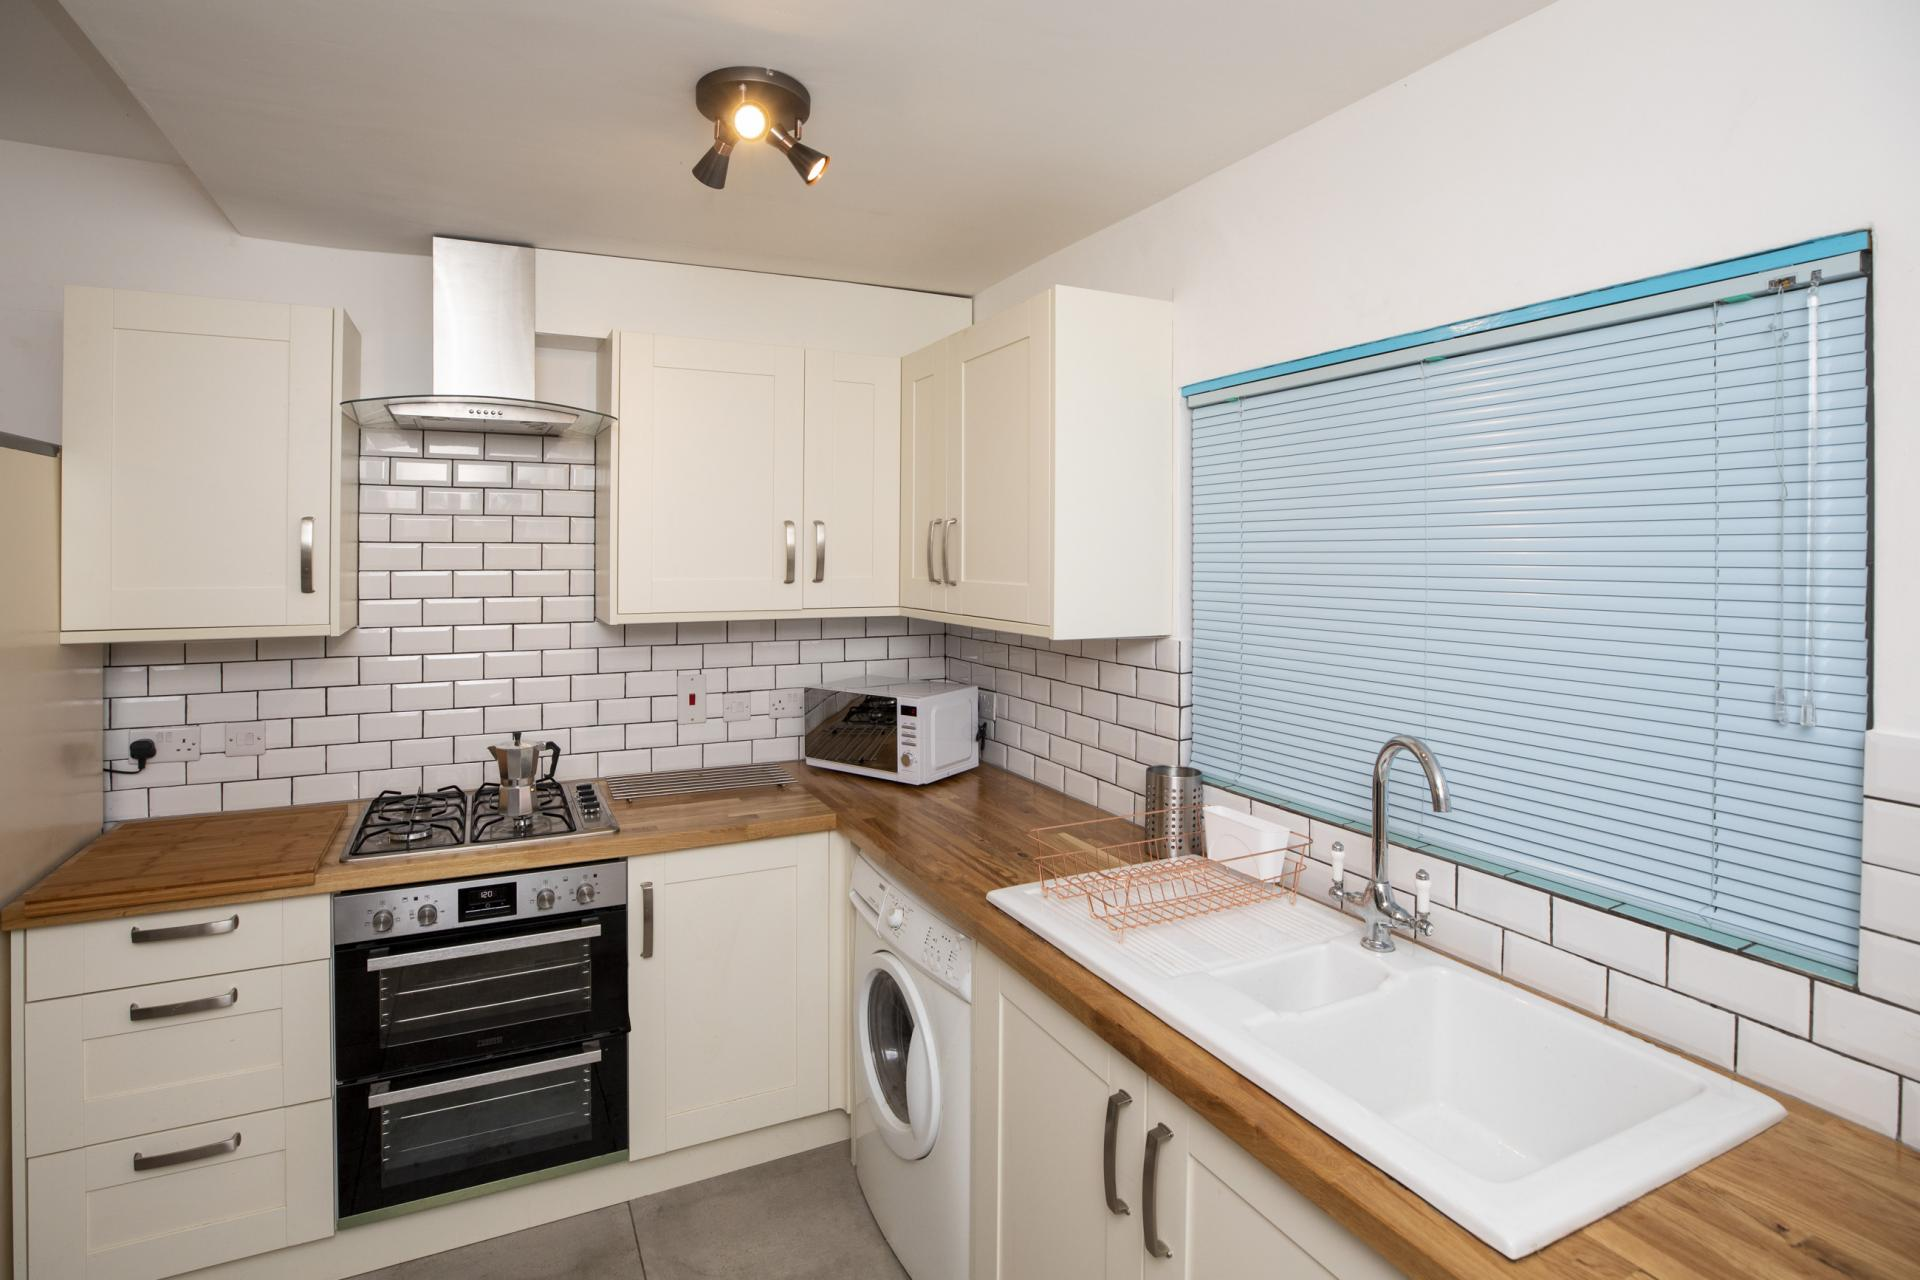 Kitchen at Nottingham Arthouse, Sneinton, Nottingham - Citybase Apartments